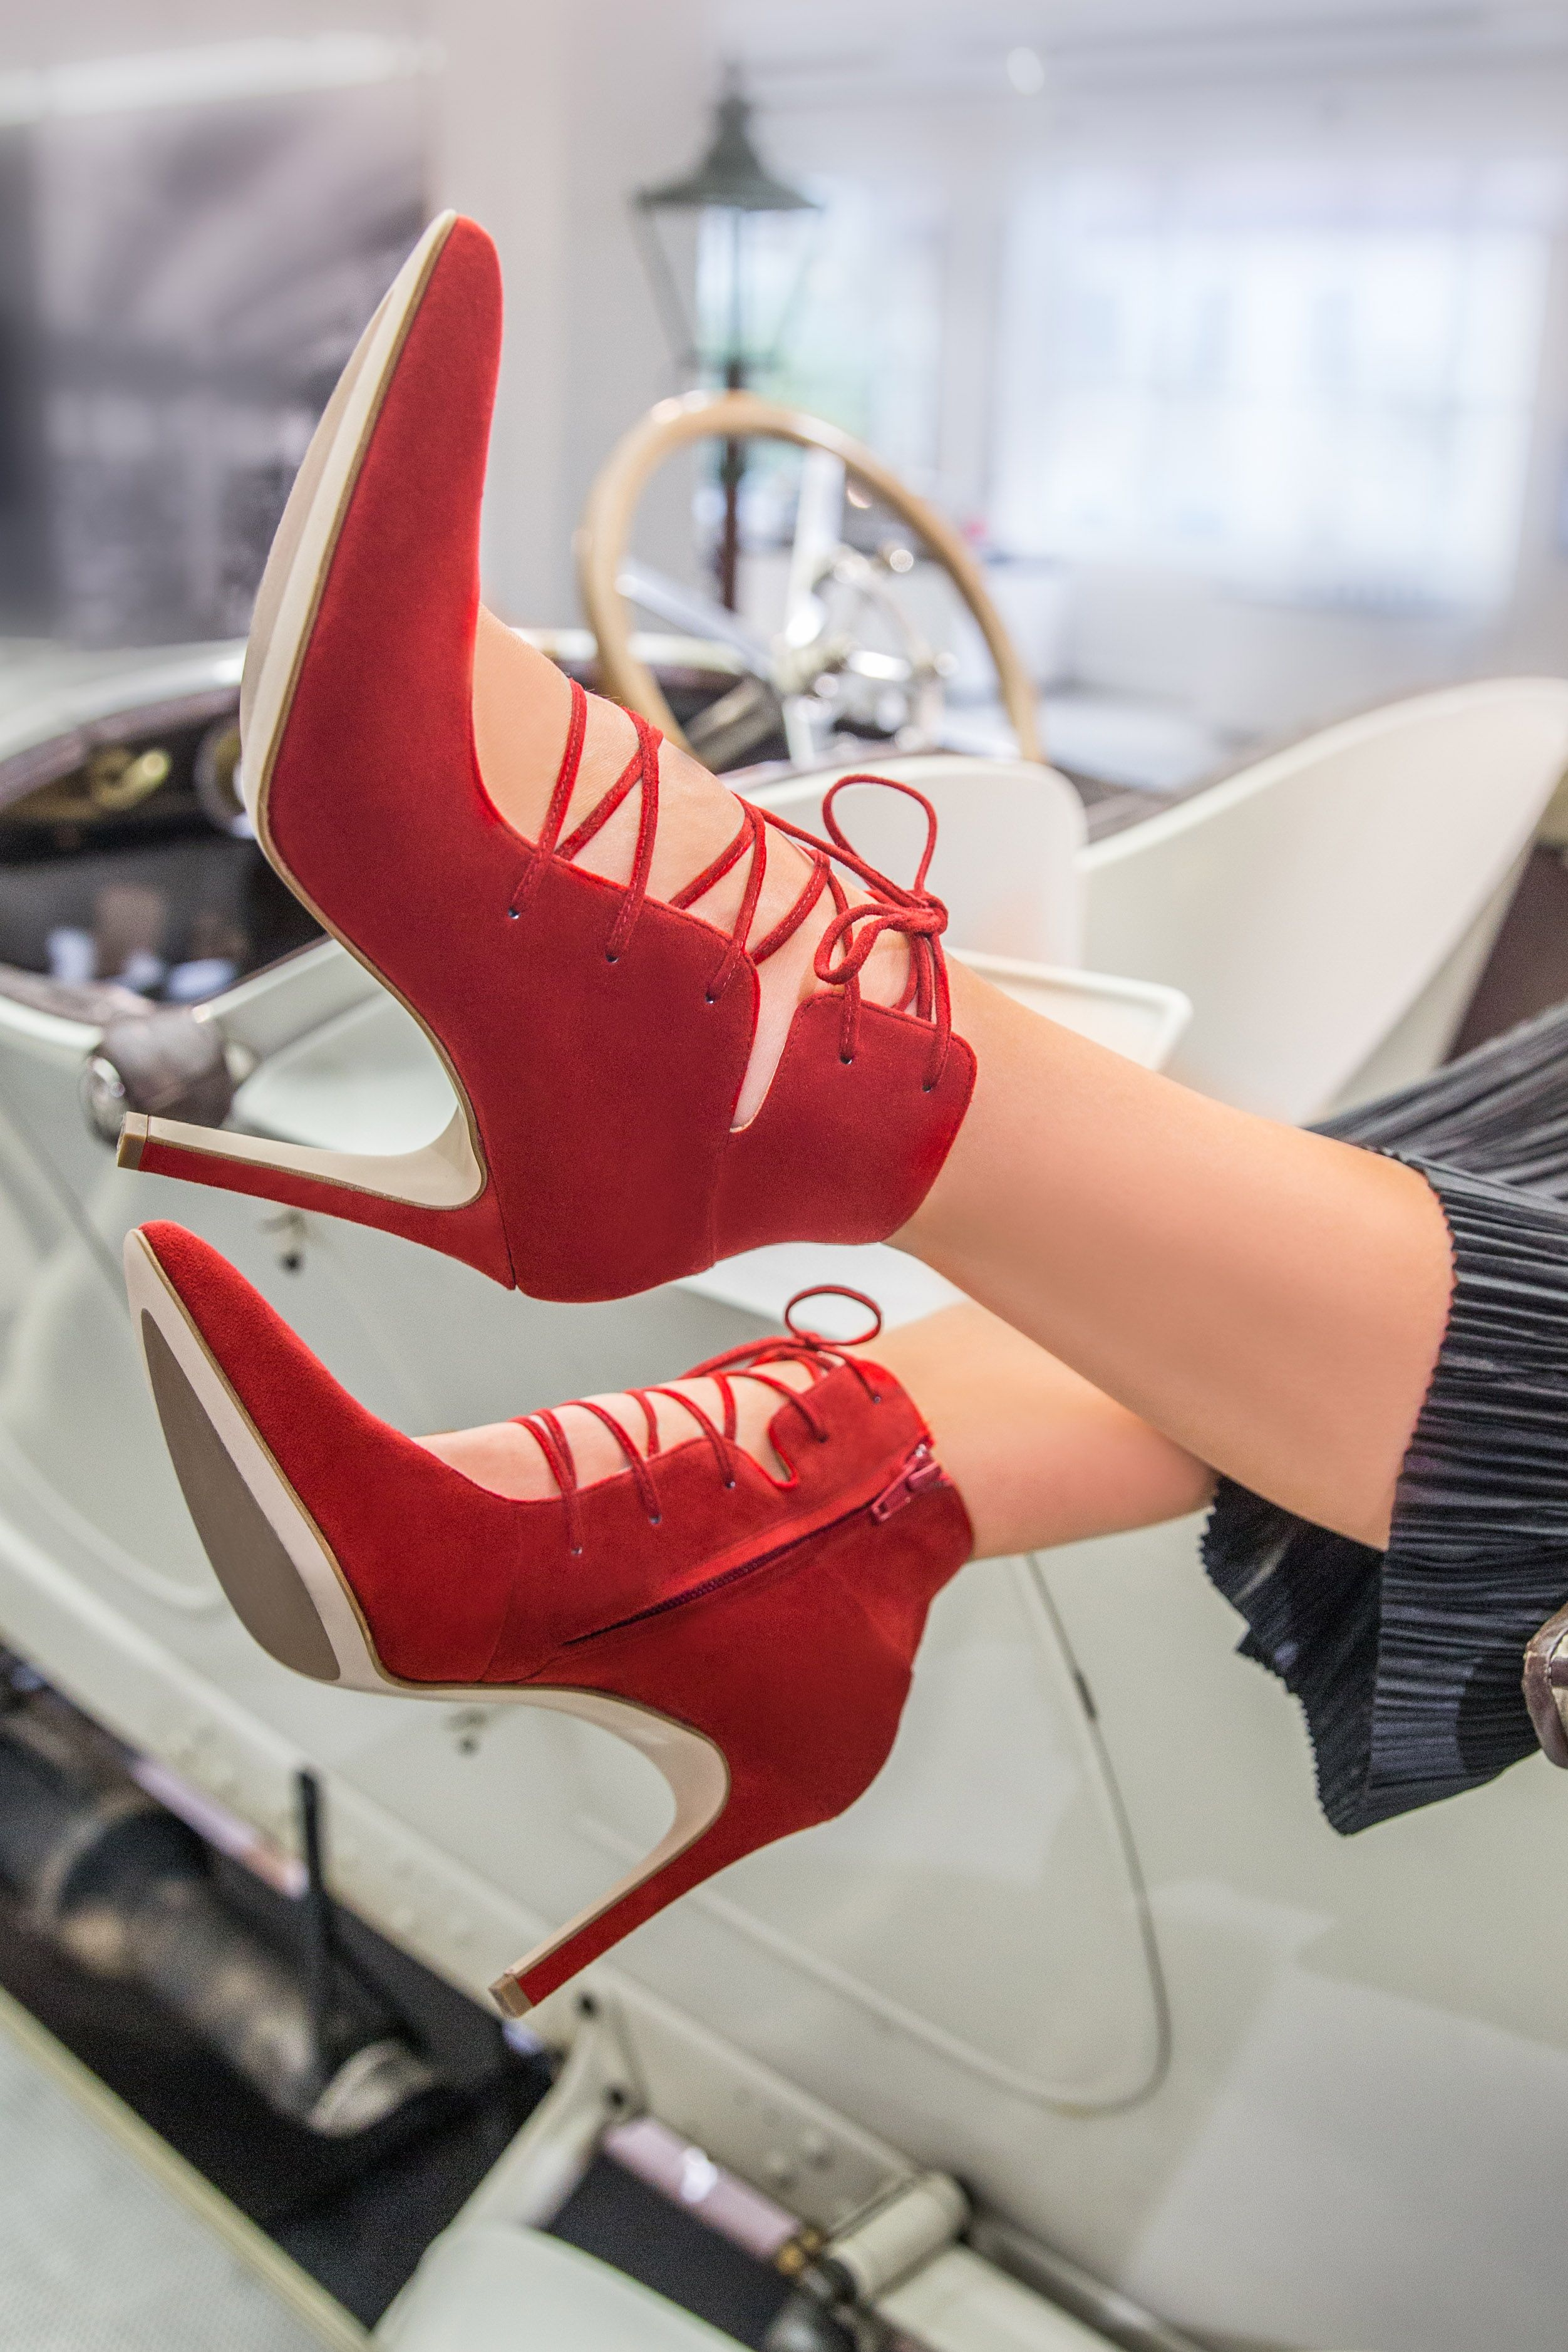 official photos 2269e fe477 Dieser Schnür-High Heel in Rot macht jedes Outfit zum ...